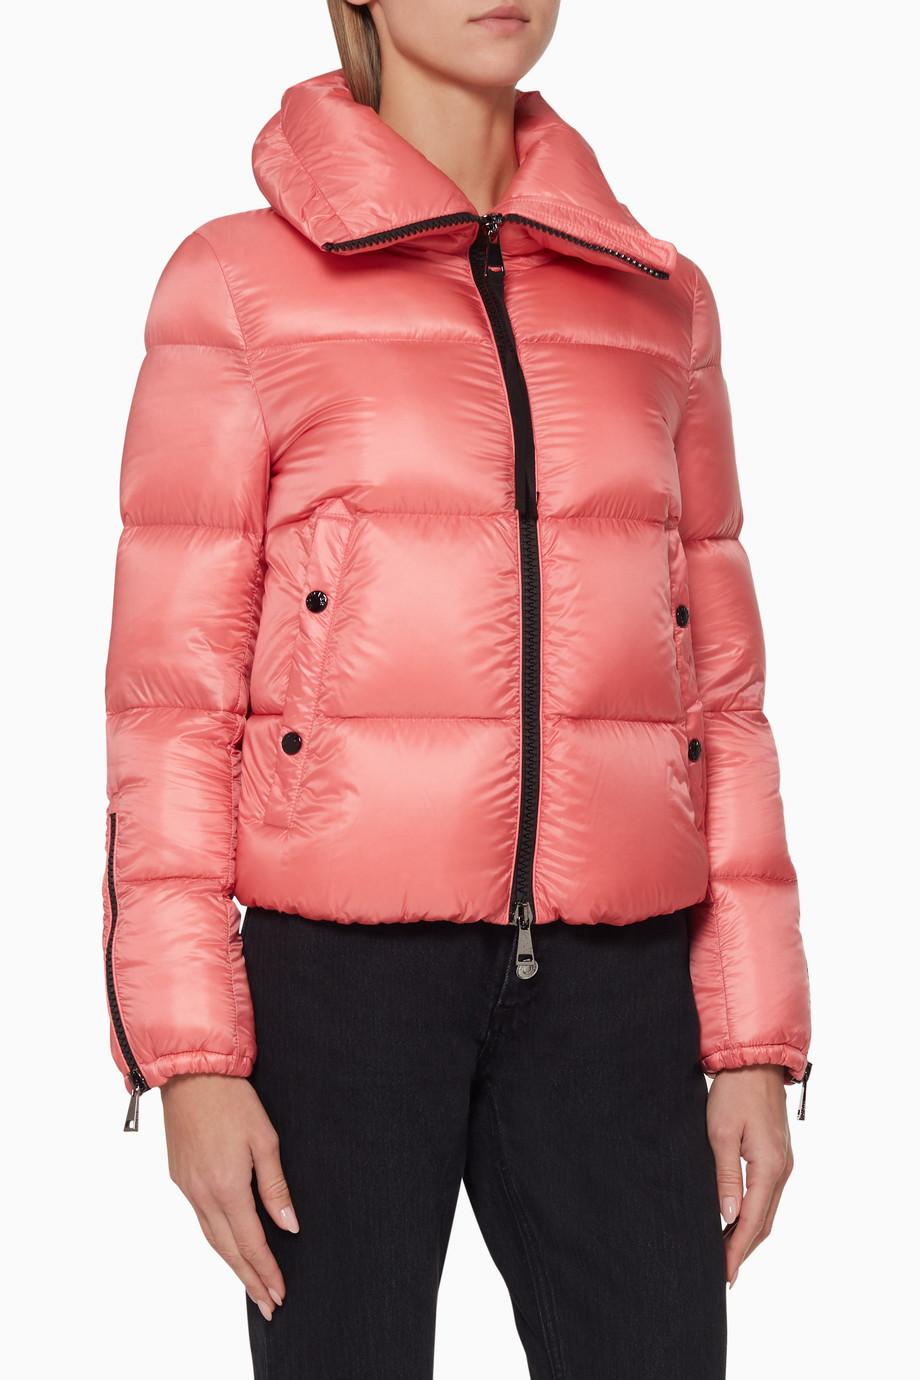 c8018d408 Shop Moncler Pink Bandama Quilted Down Jacket for Women | Ounass Saudi